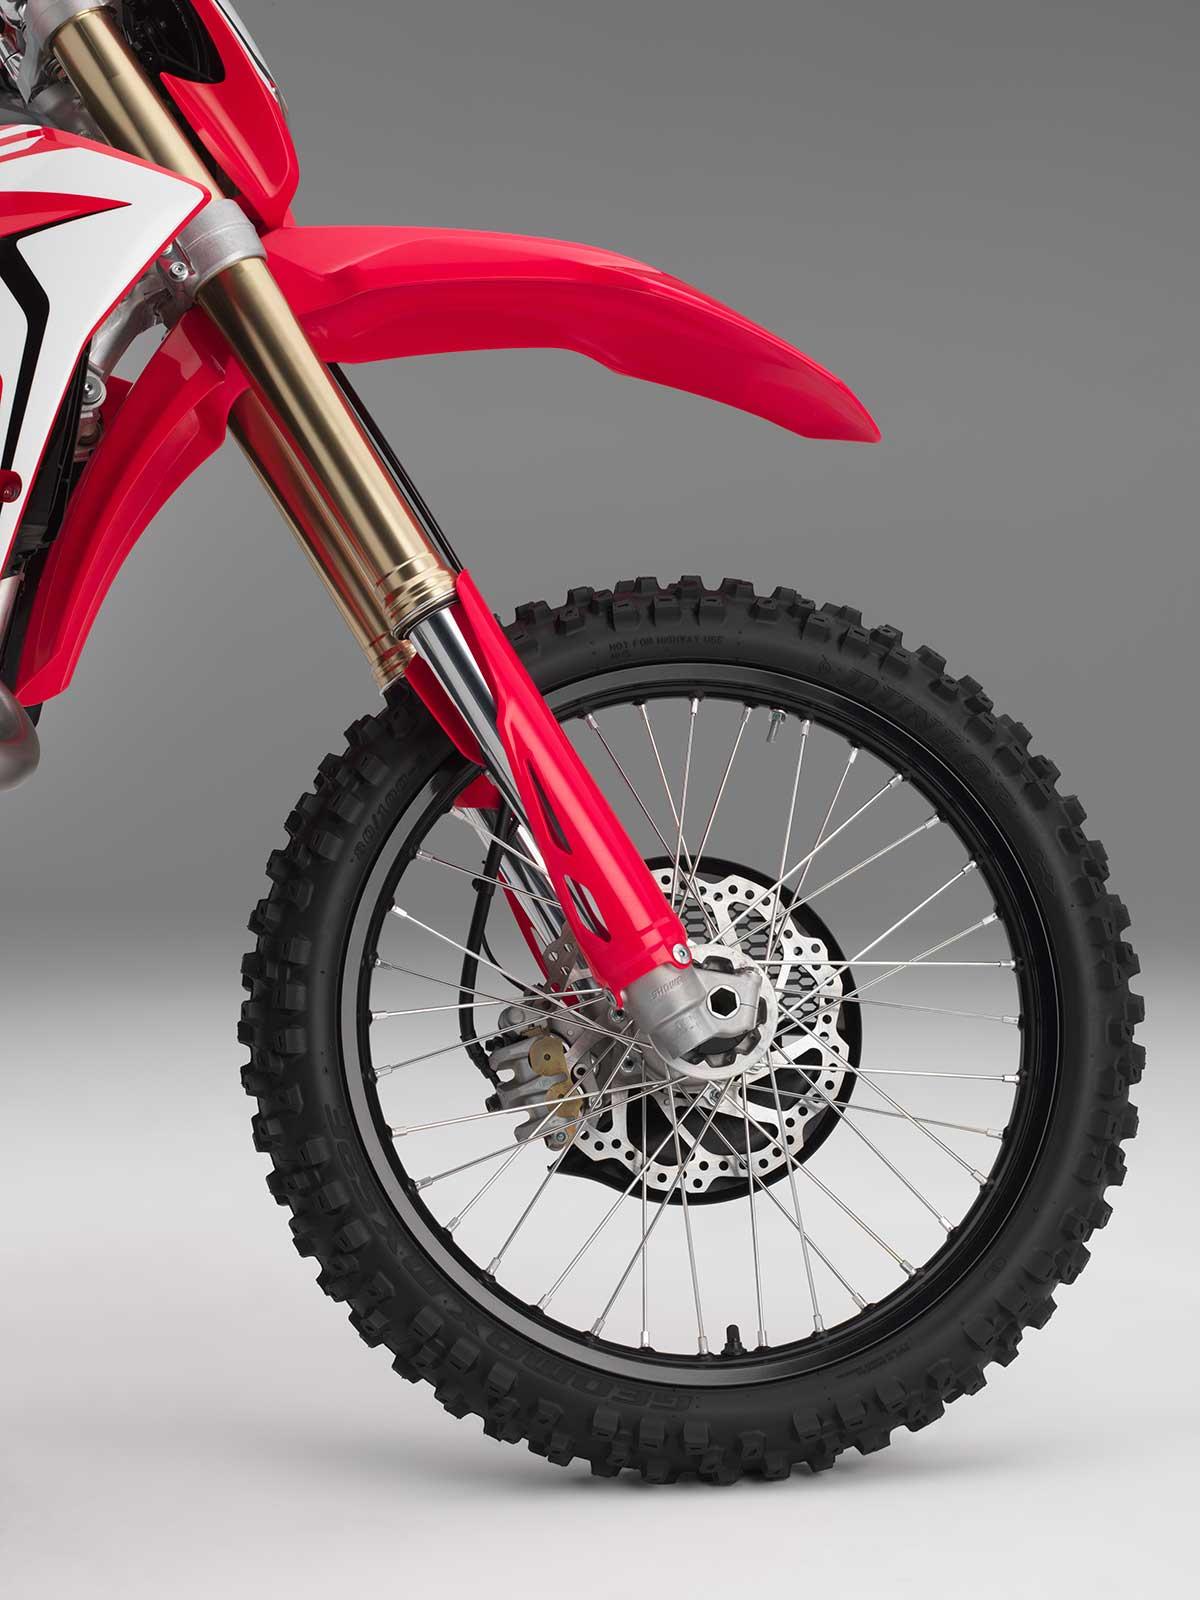 19-Honda-CRF450X_front-wheel.jpg